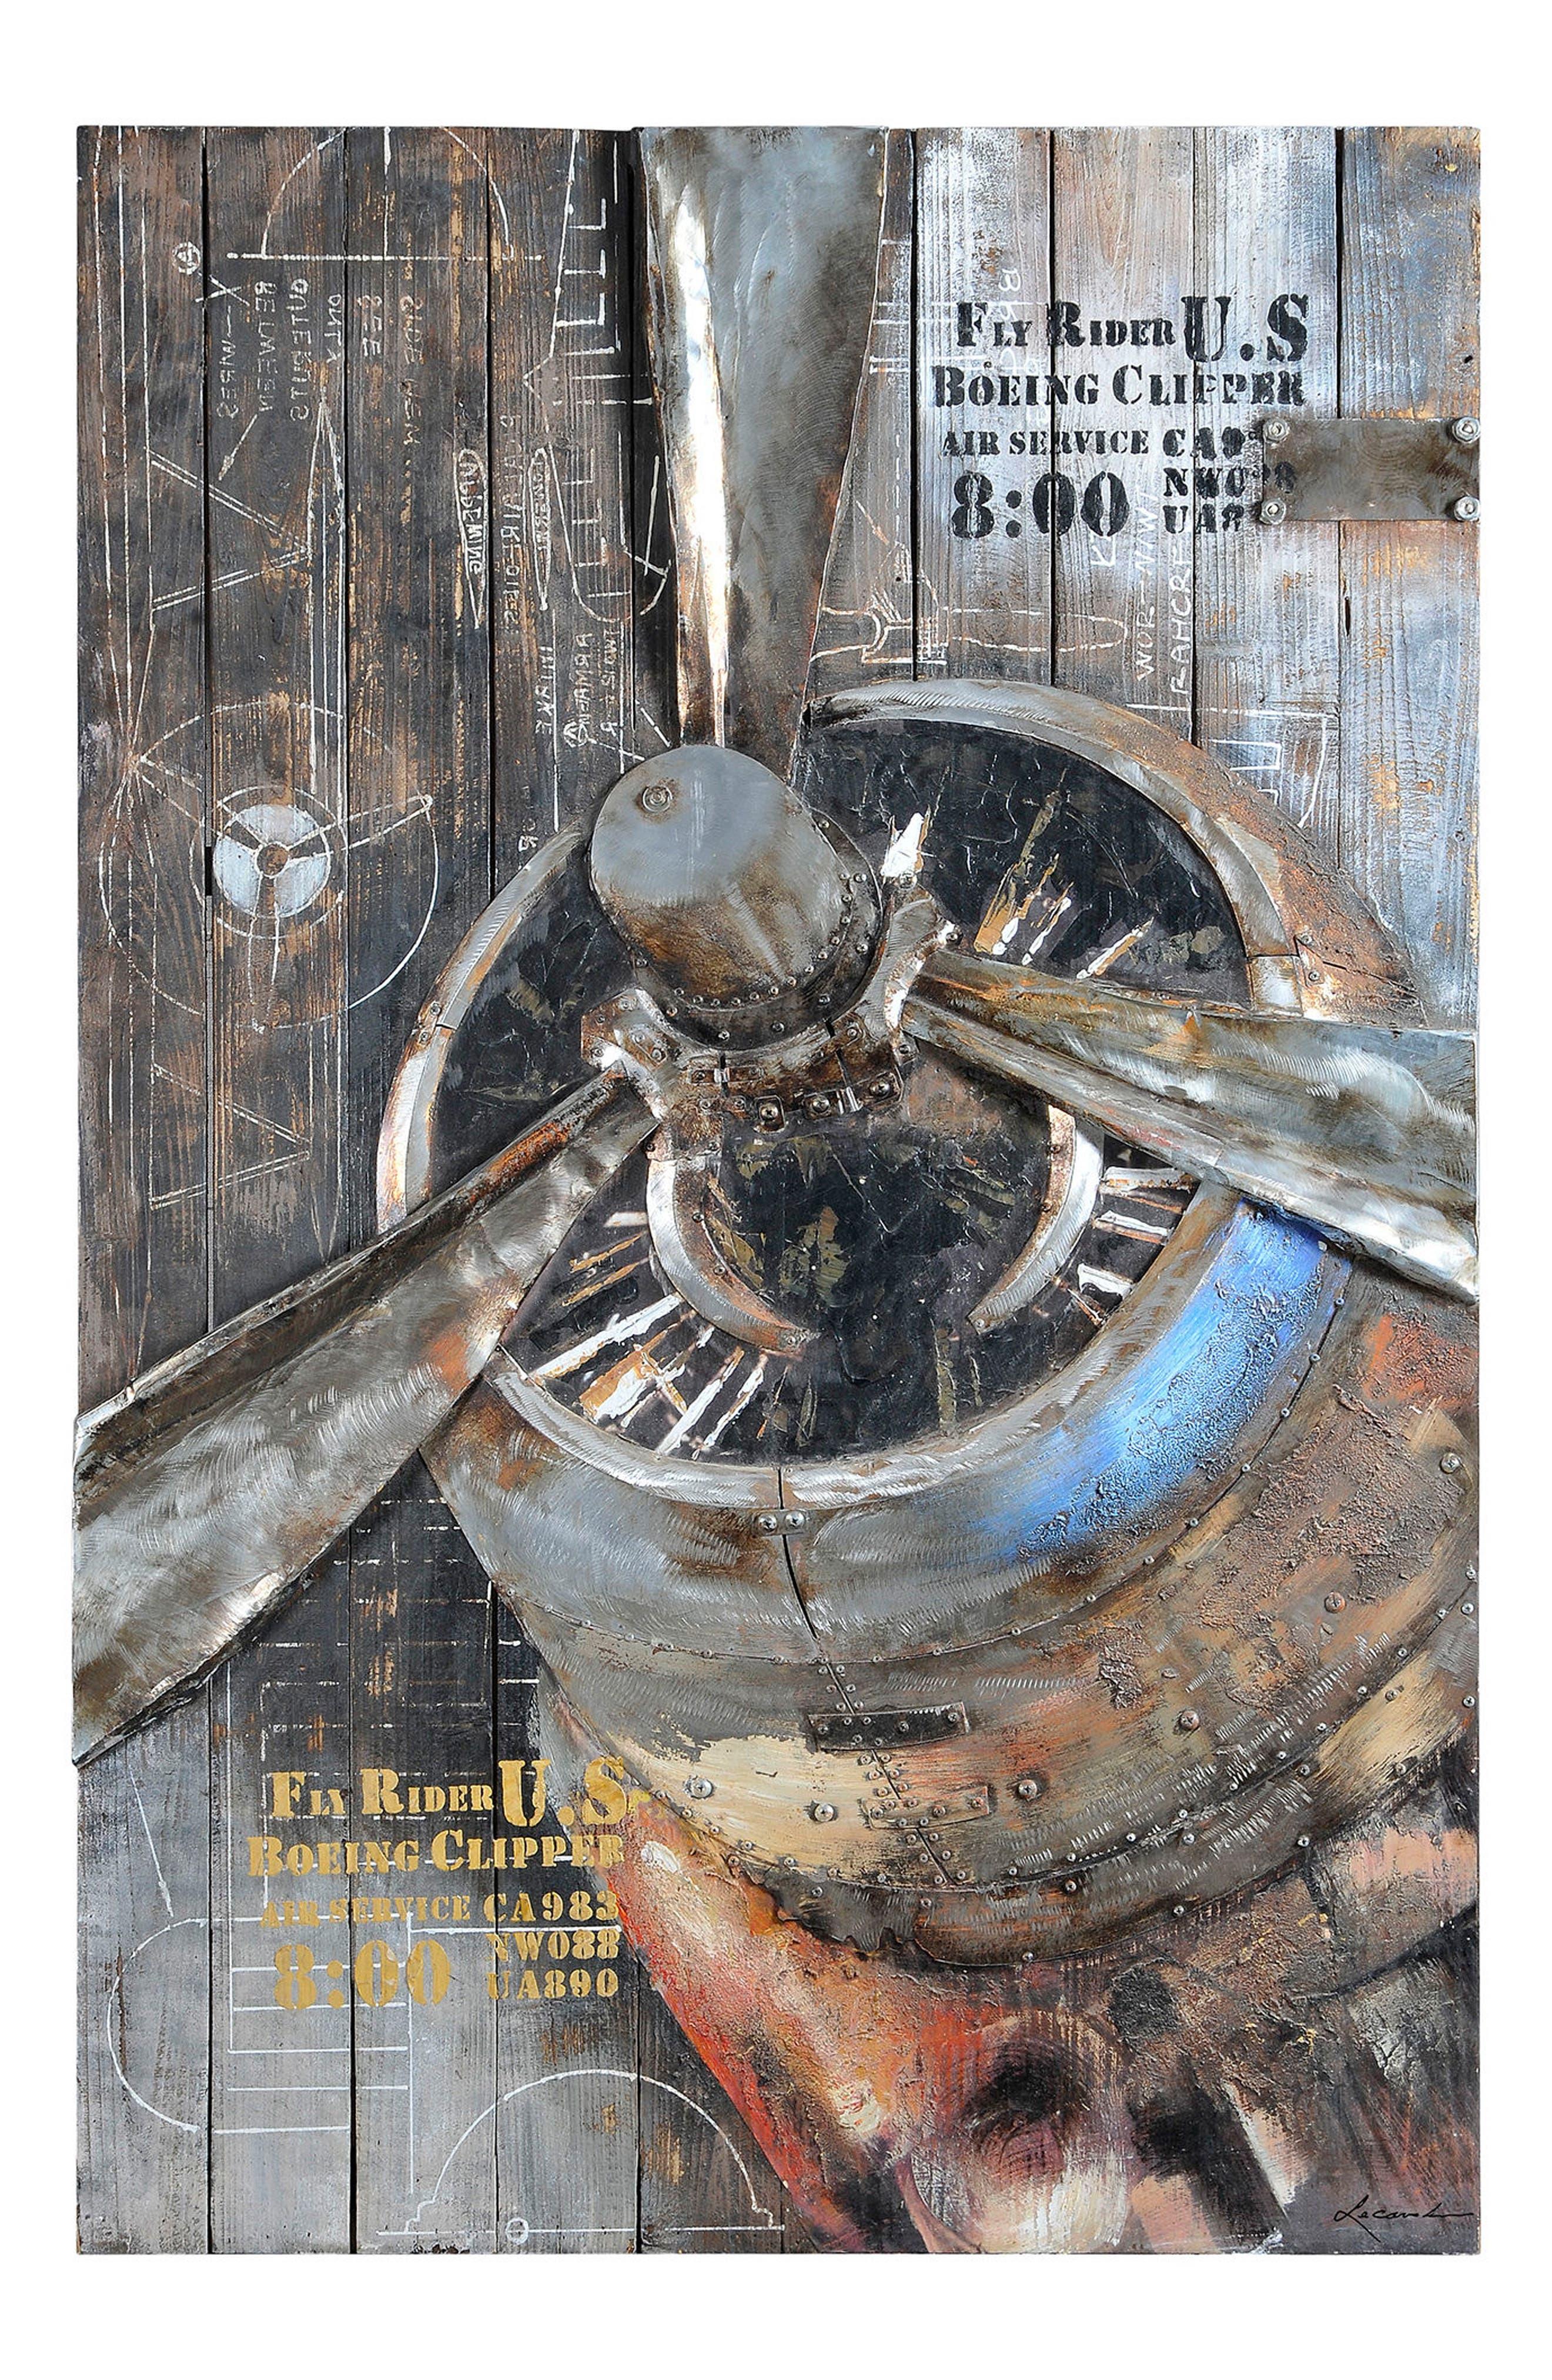 Fly Rider Propeller Wall Art,                             Main thumbnail 1, color,                             020